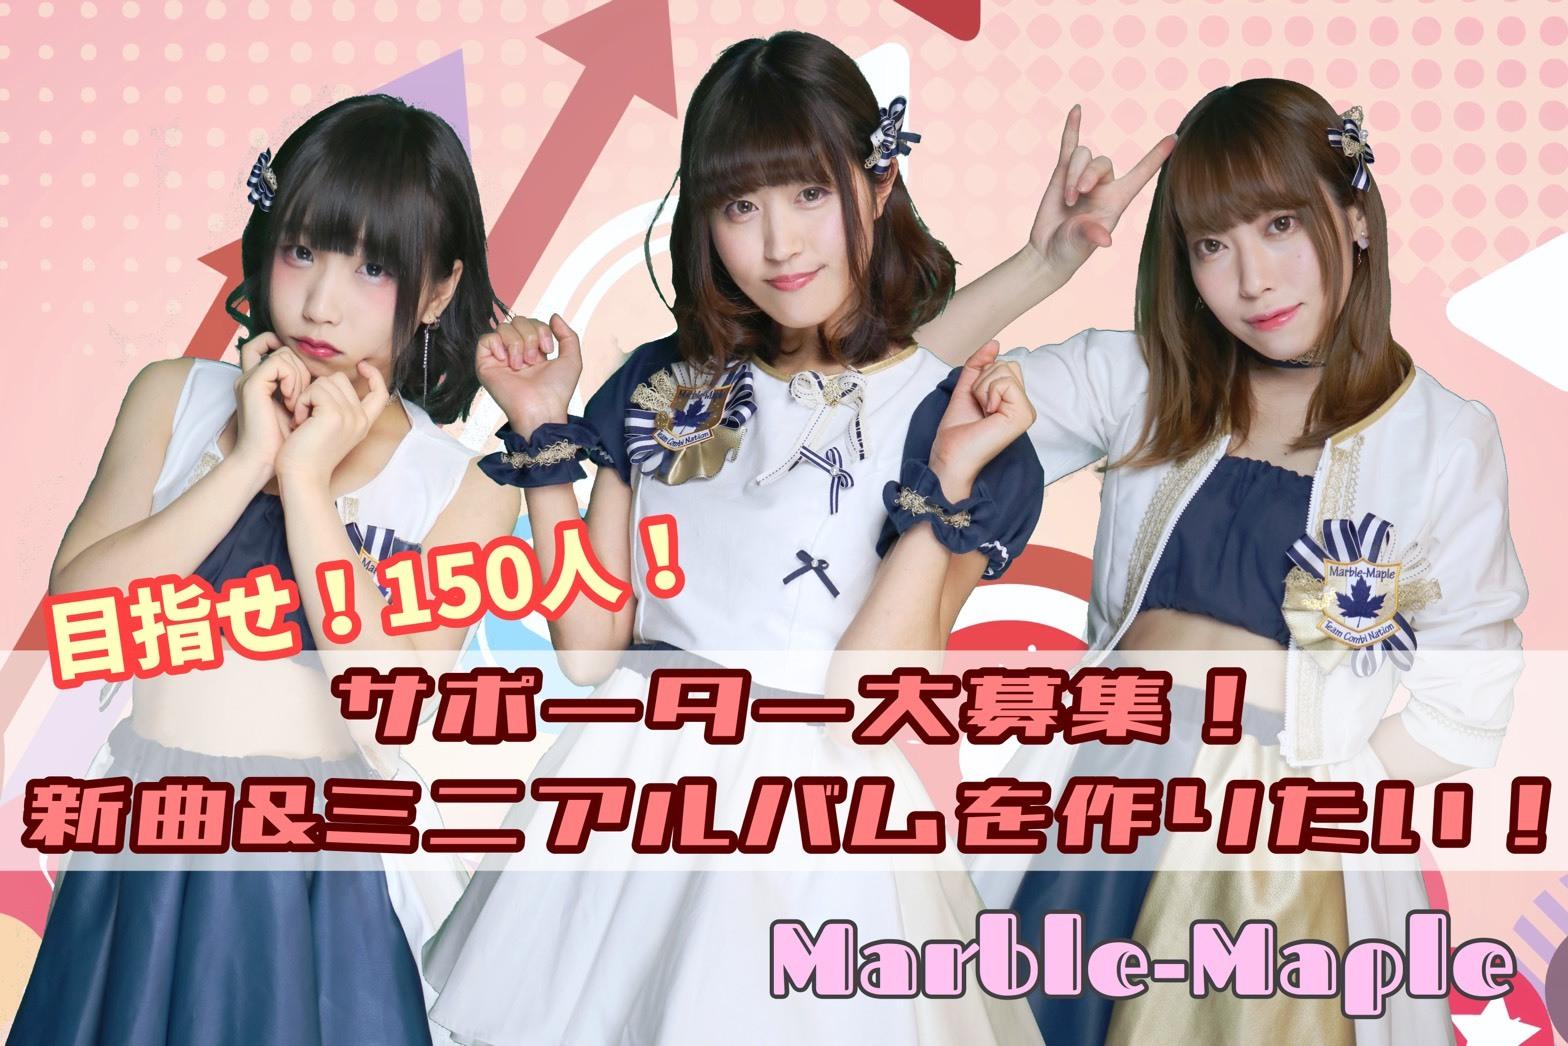 【Marble-Maple】新体制スタートダッシュプロモーションキャンペーン!